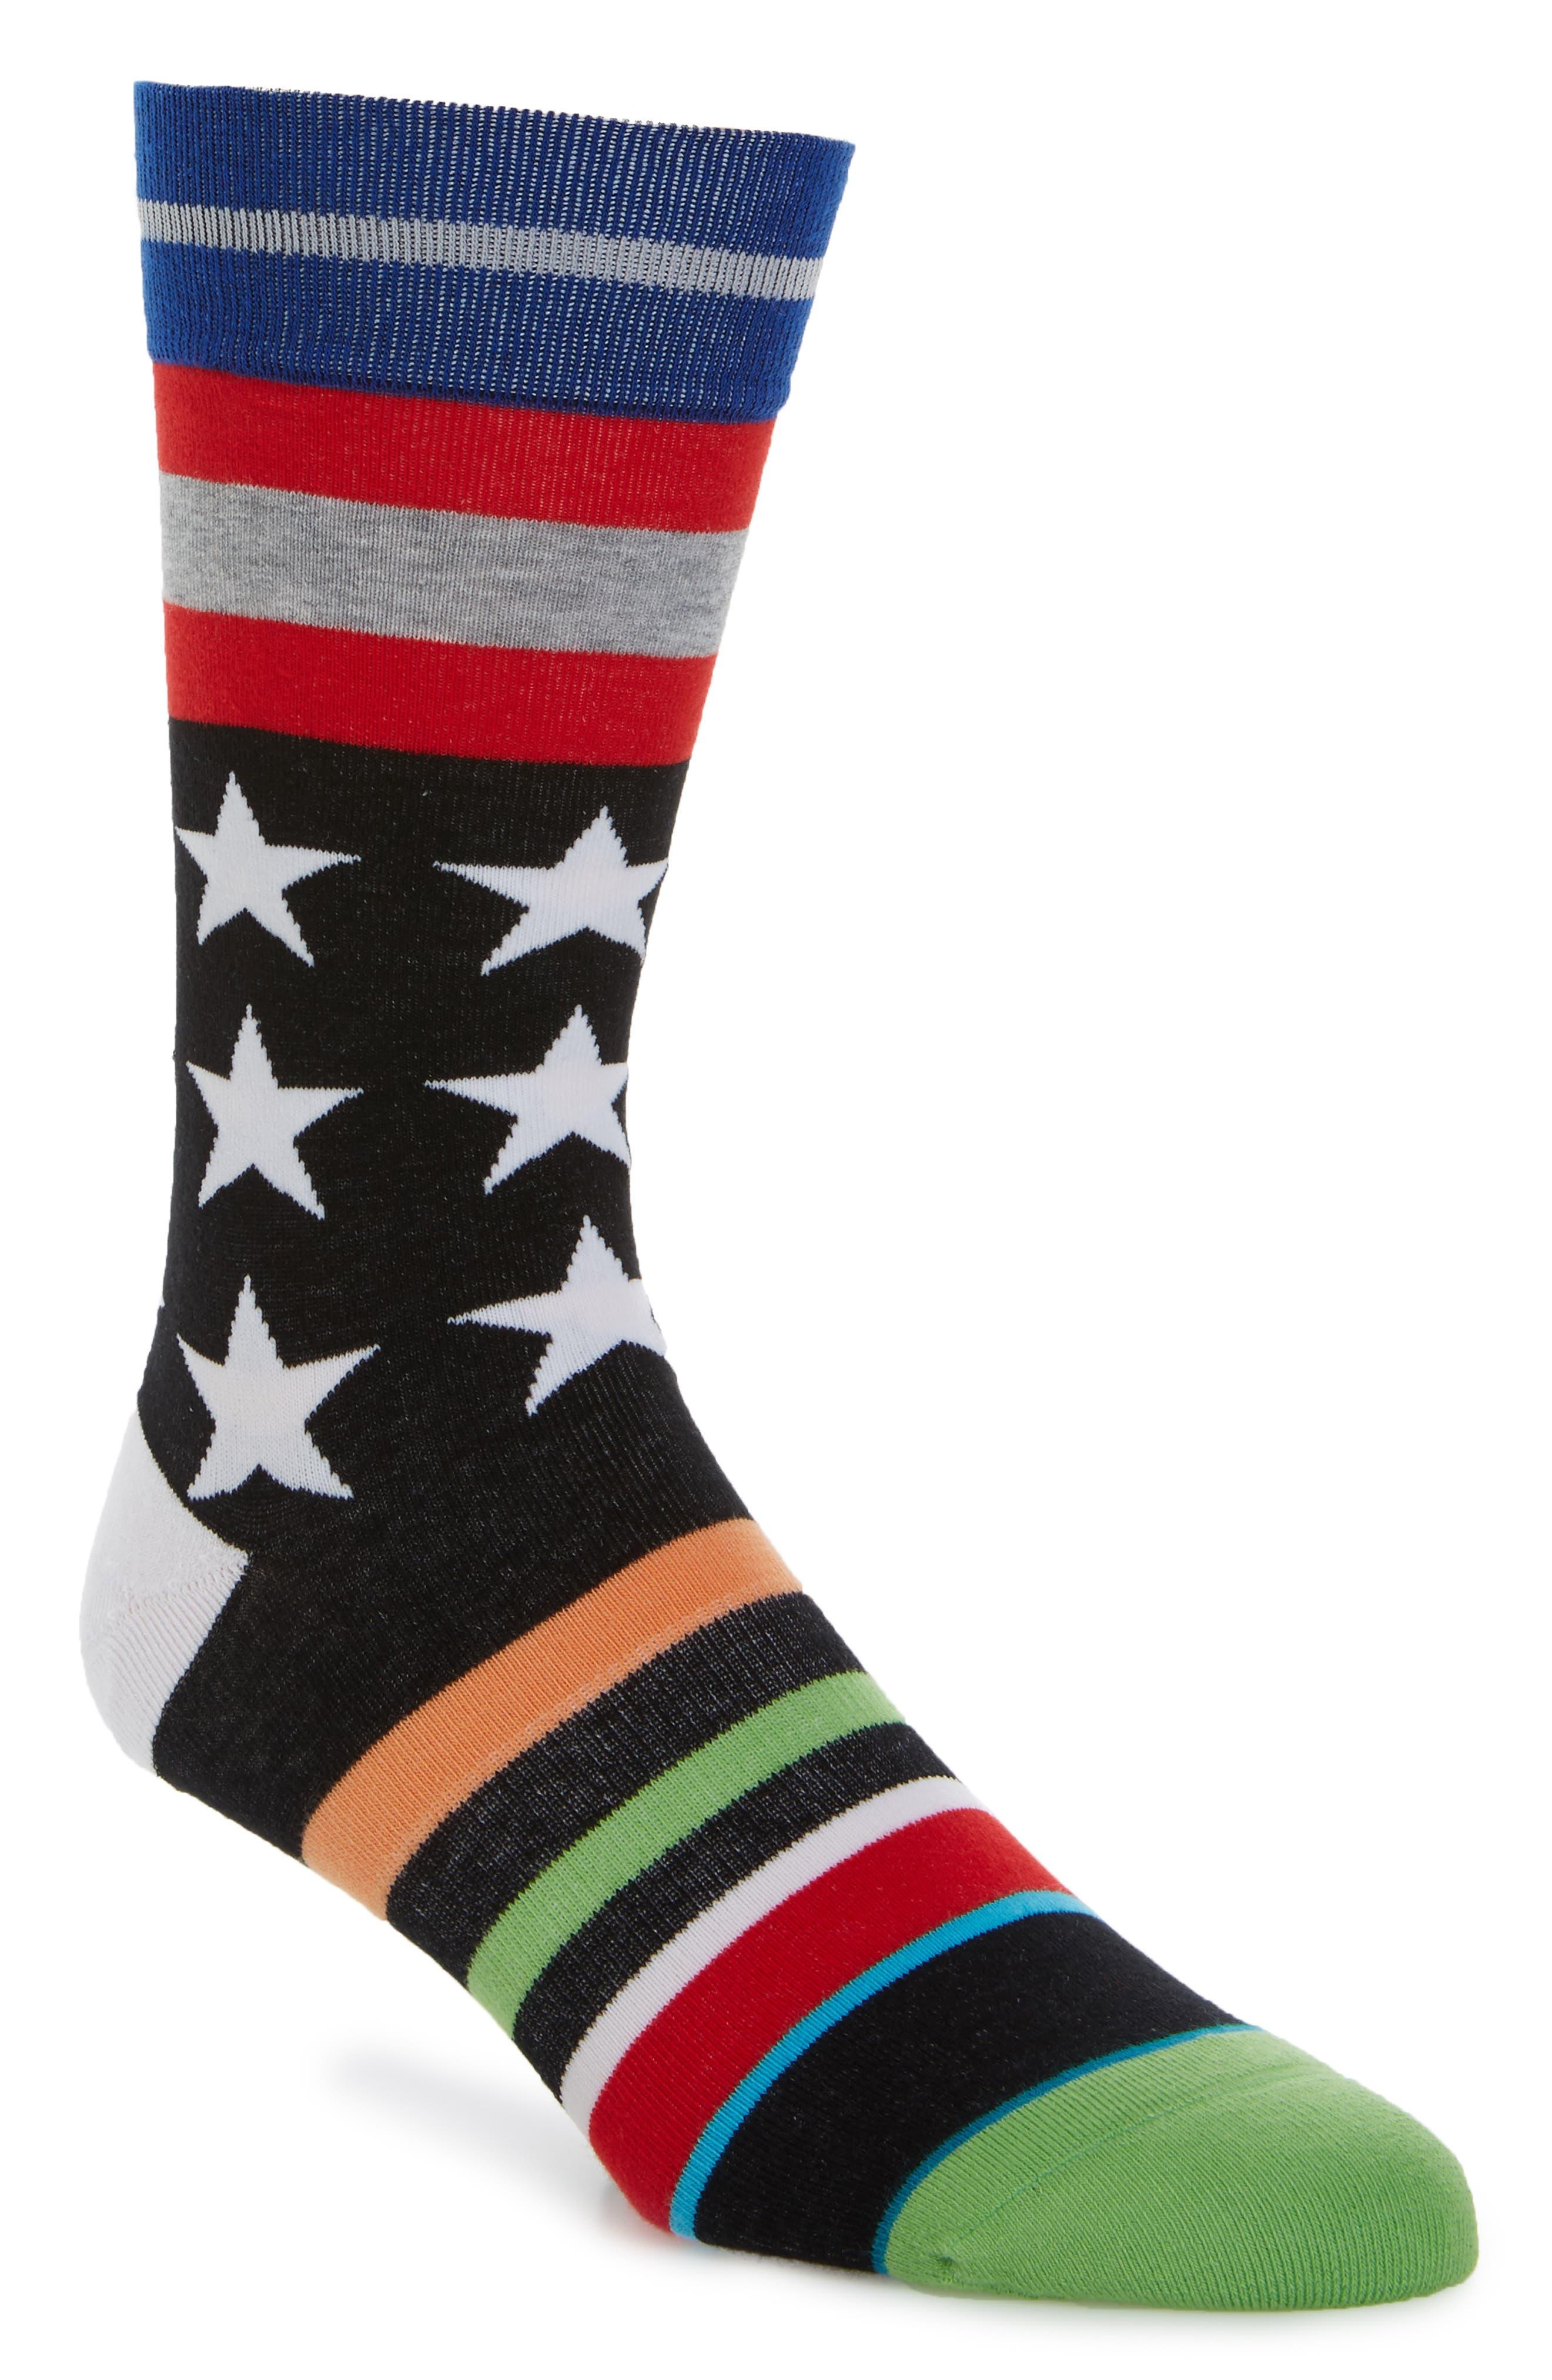 Harden Salute Socks,                         Main,                         color, Black